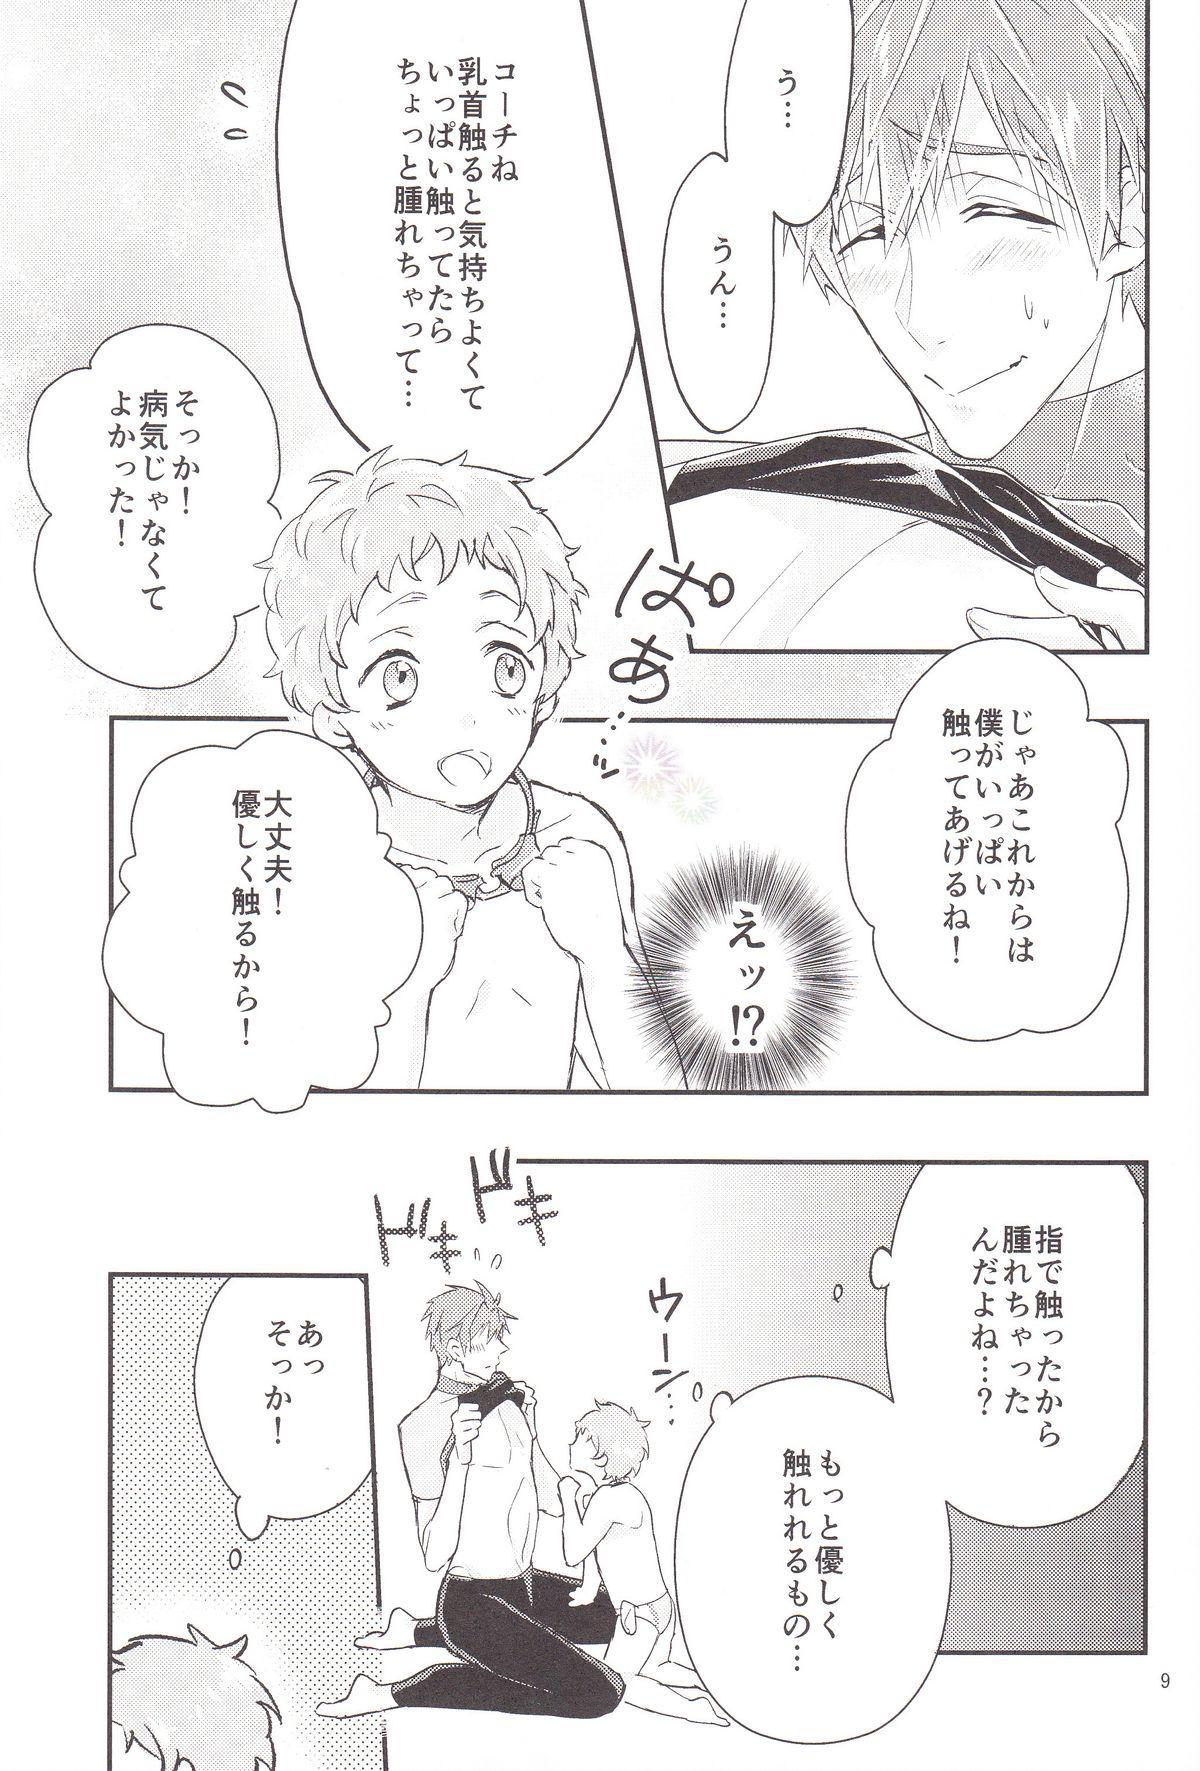 Tachibana Coach no Kojin Lesson 7